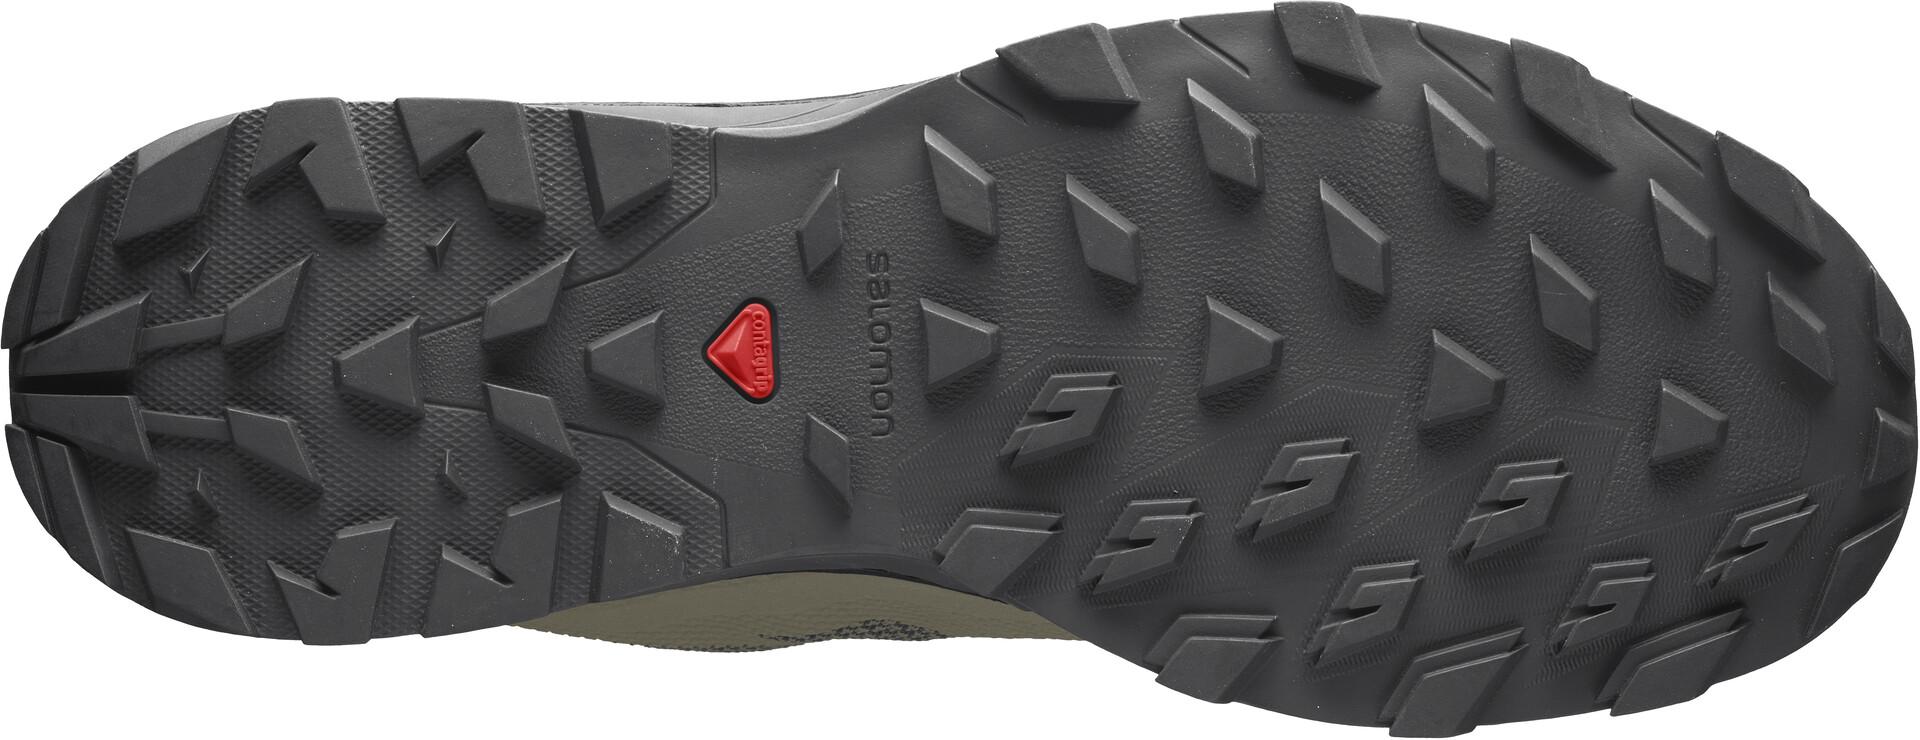 Salomon OUTline GTX Chaussures Homme, burnt oliveblacksafari